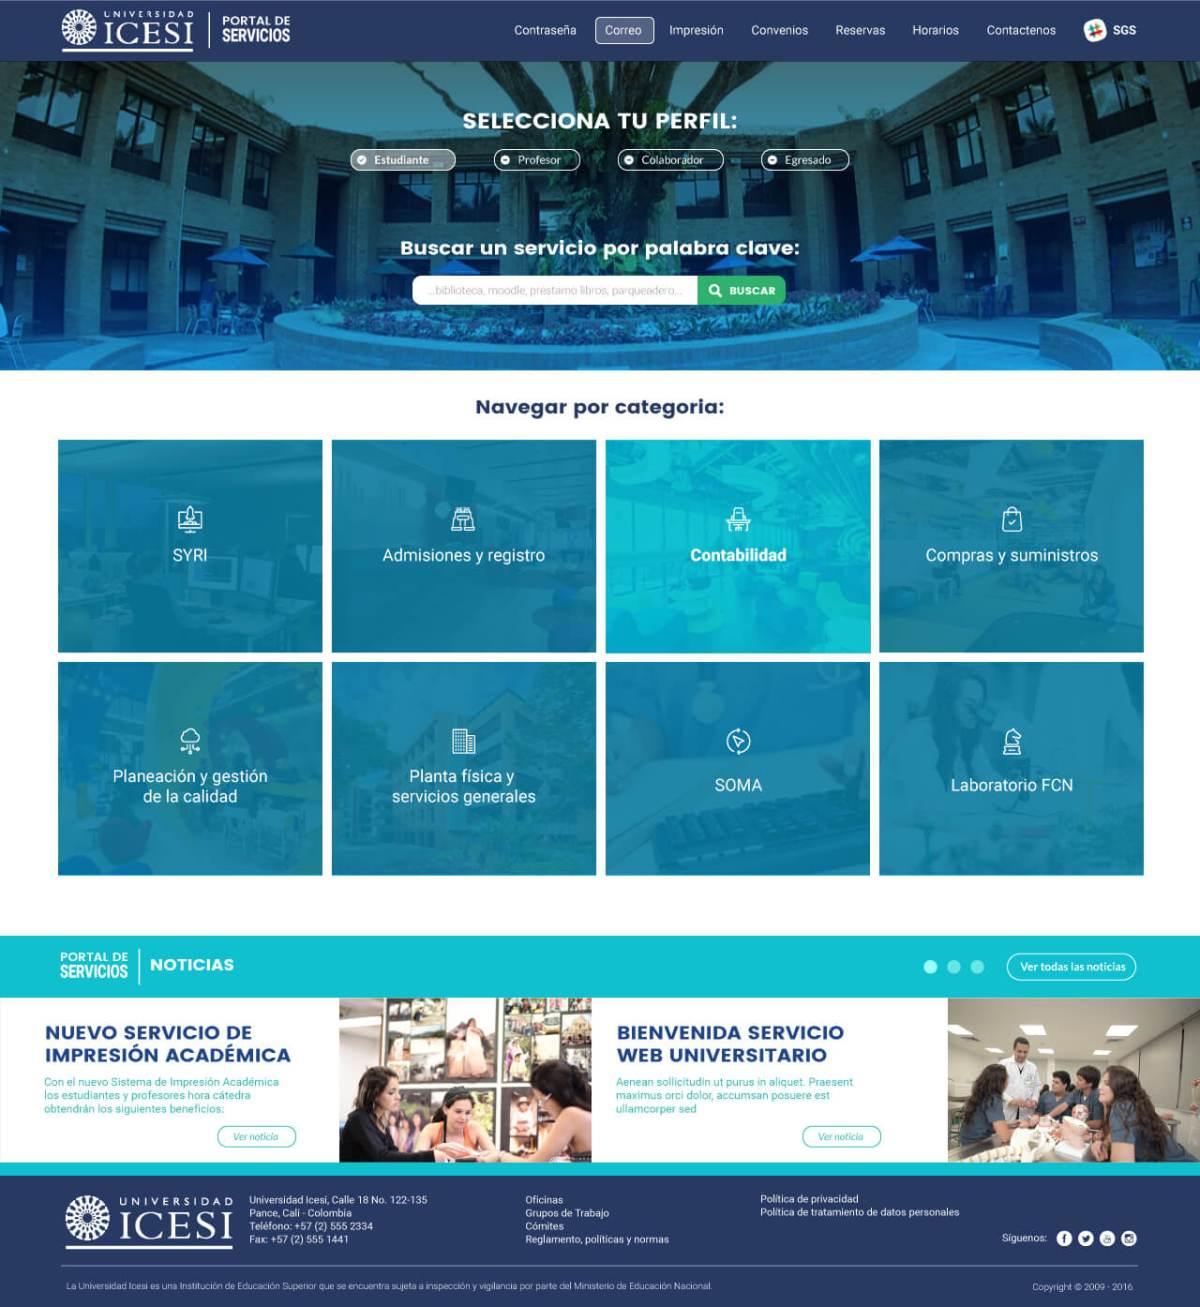 Portal Servicios Icesi - Universidad Icesi